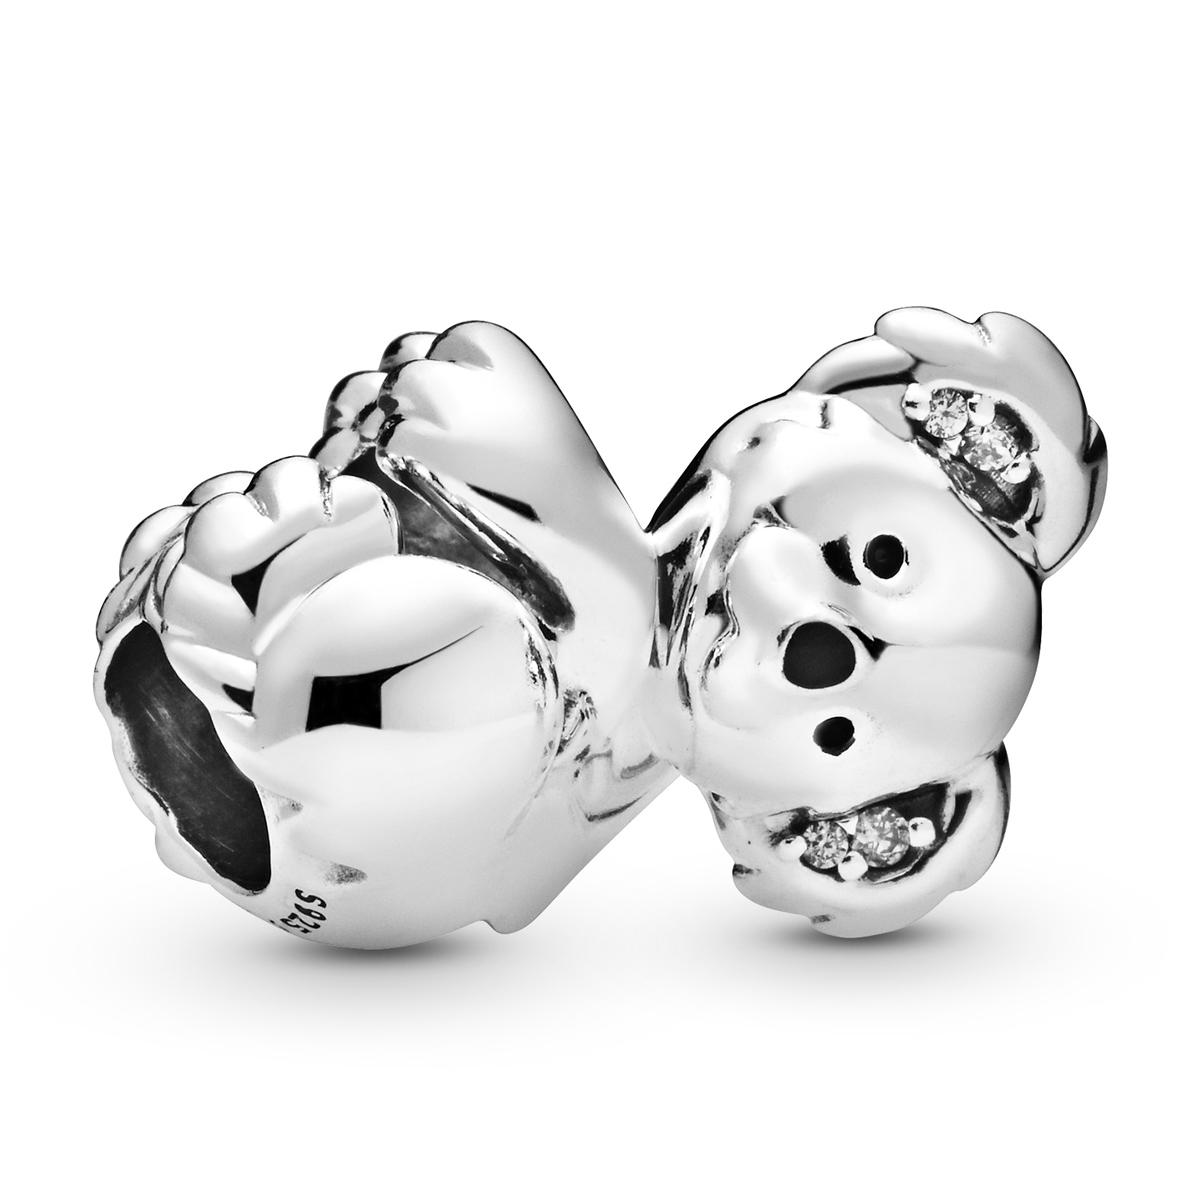 Pandora Koala Charm - Pancharmbracelets.com